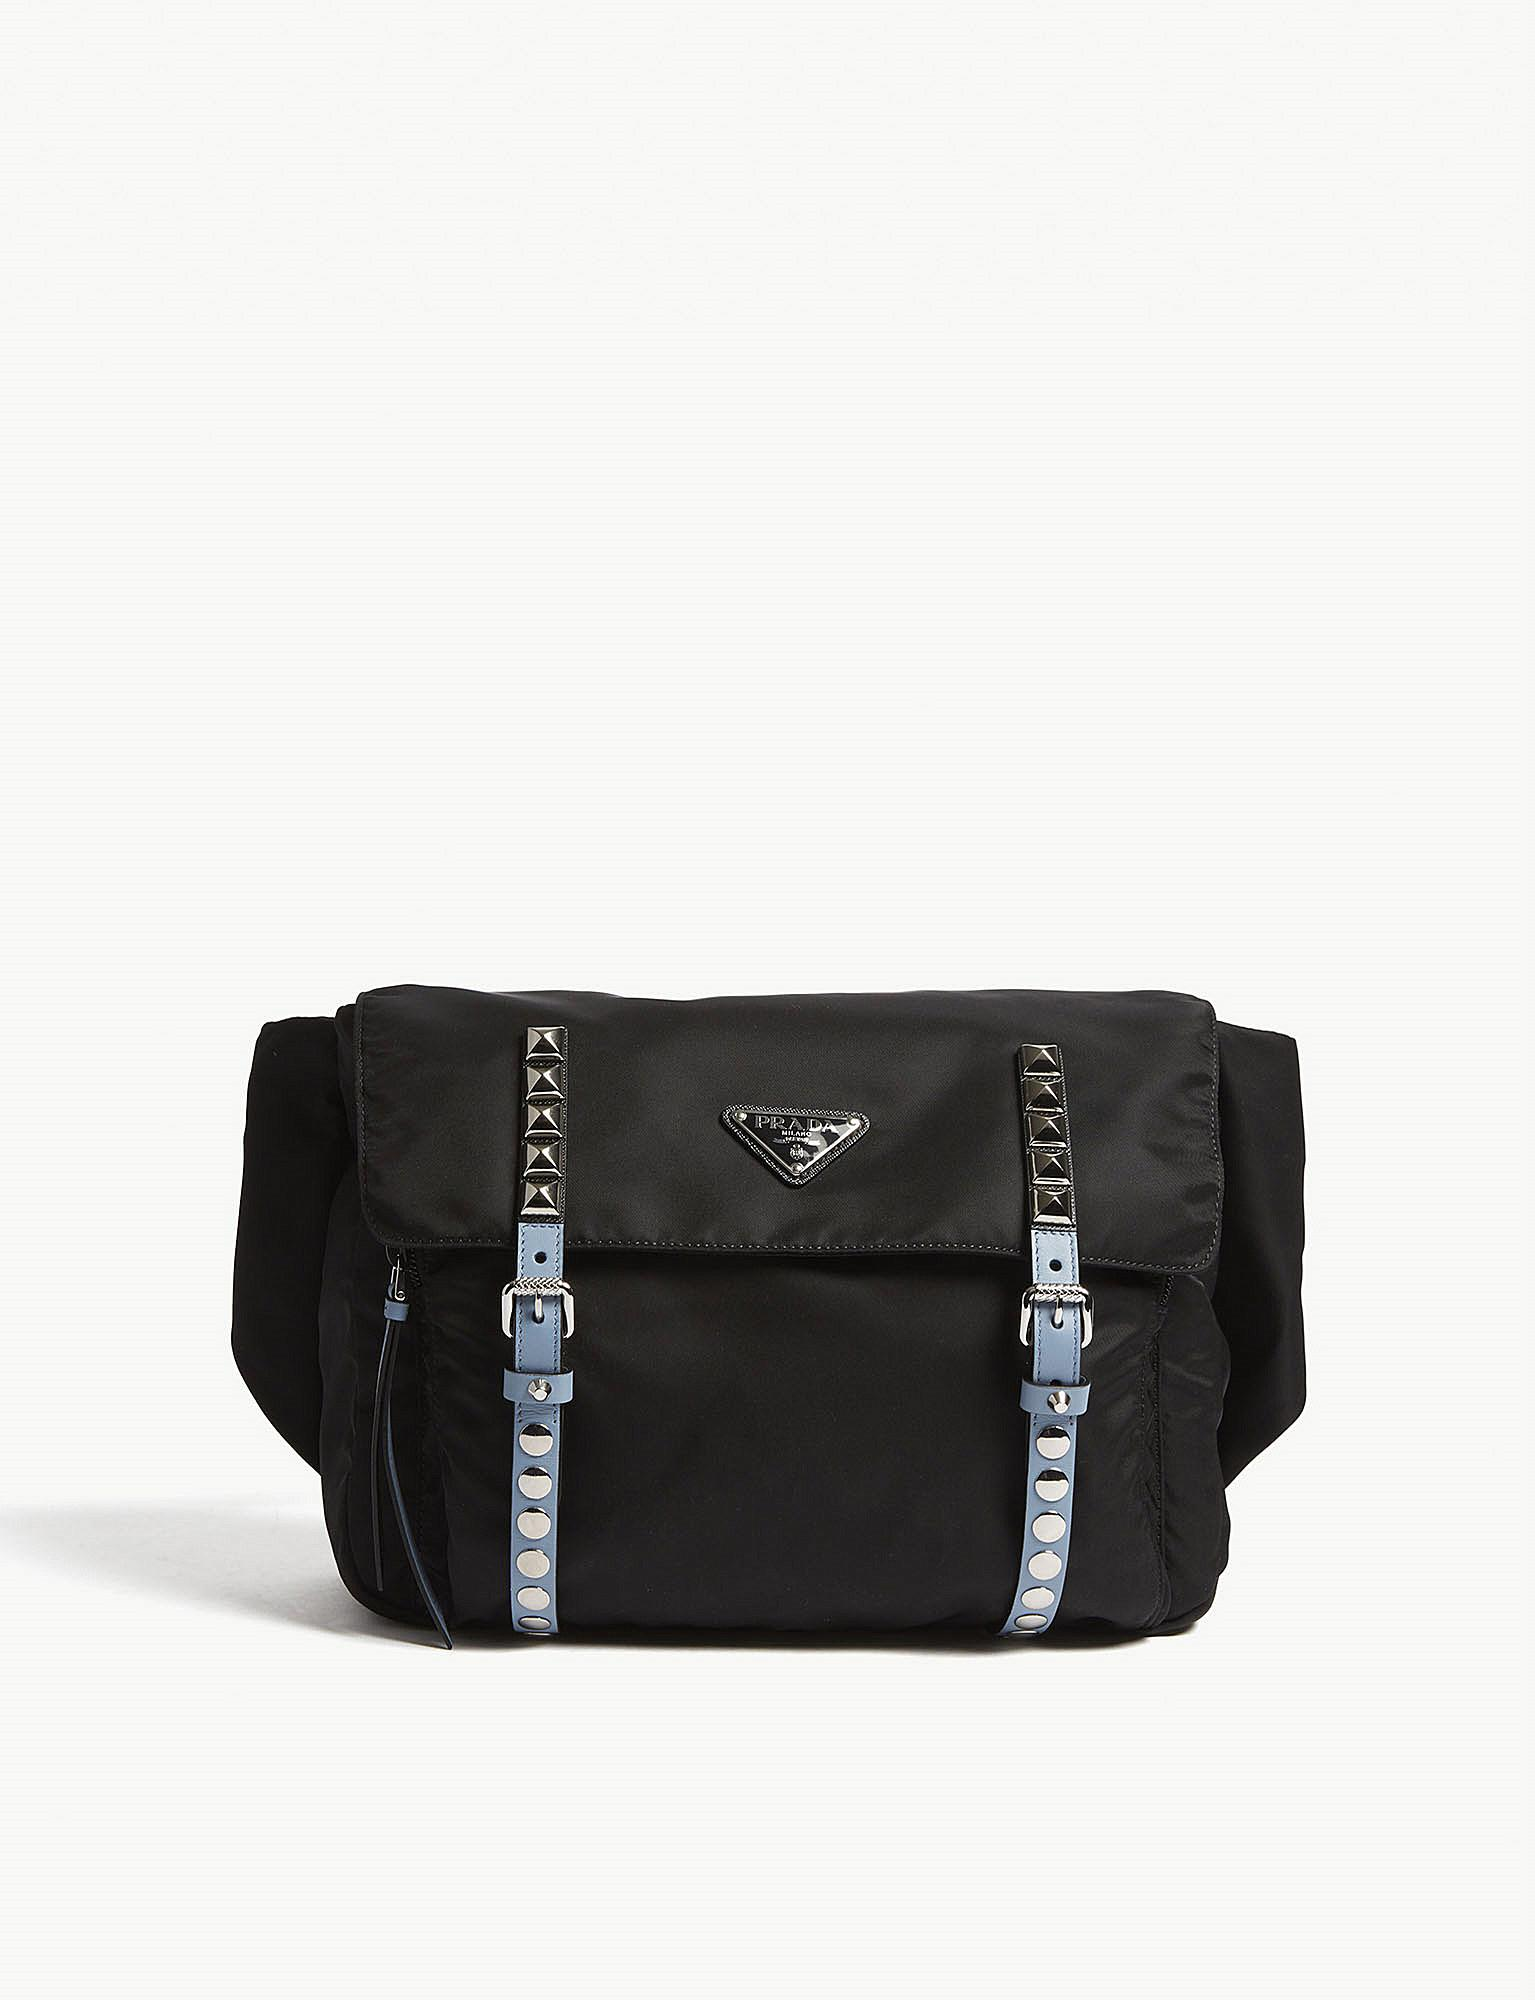 9a8a26482c1f Prada - Ladies Black Modern Studded Nylon Belt Bag - Lyst. View fullscreen